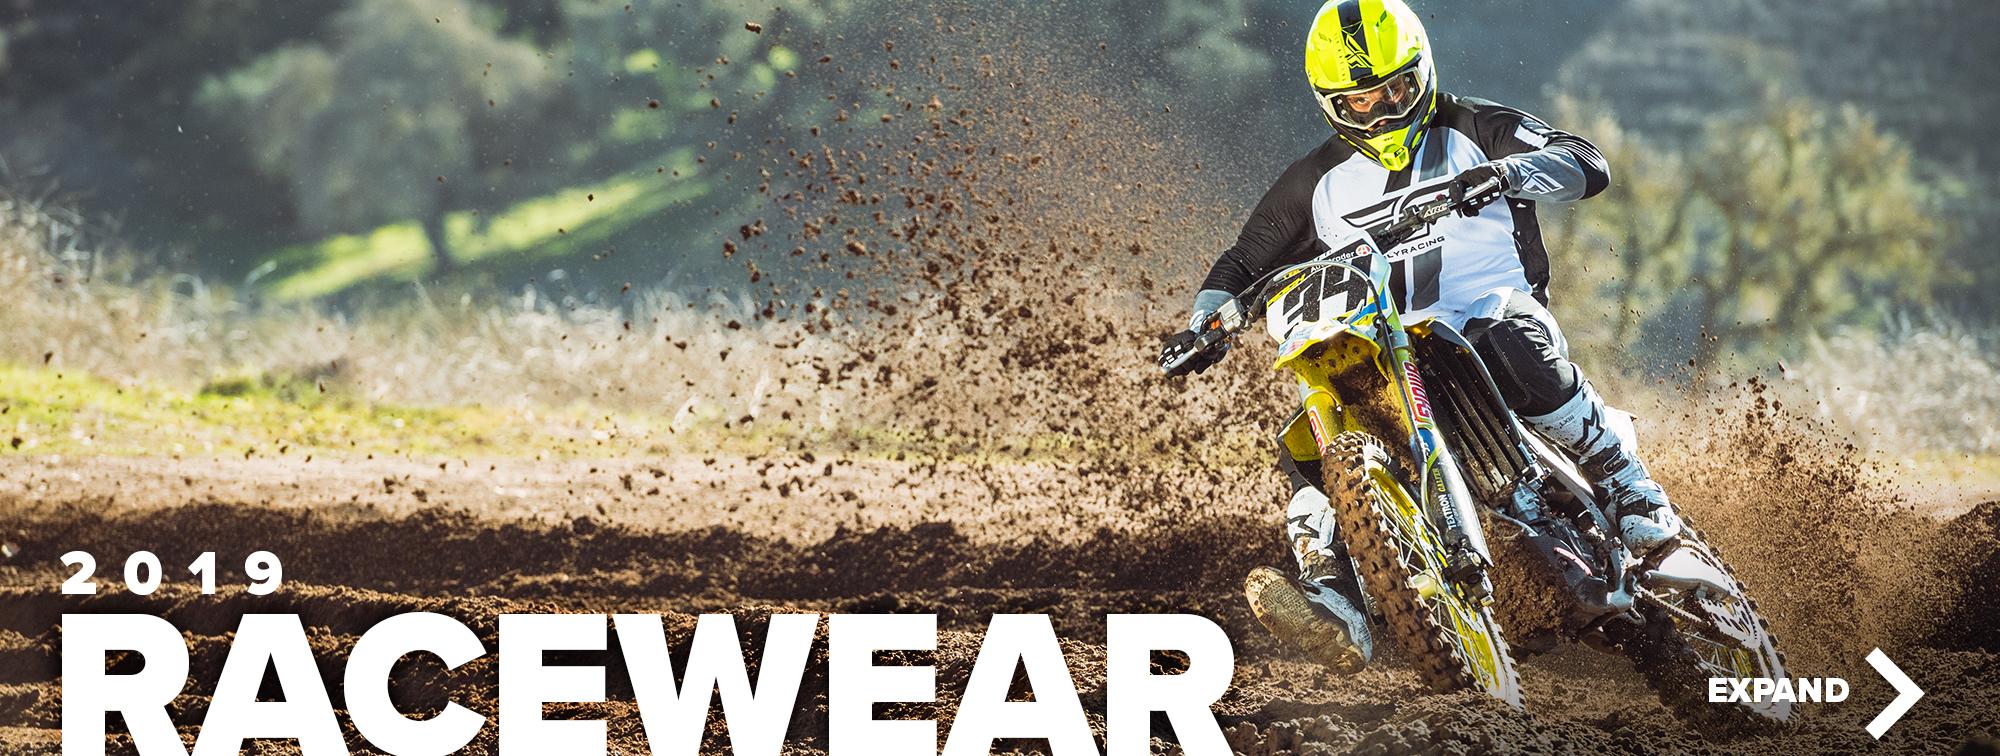 75f3922fdf35 FLY Racing 2019 Racewear Collection